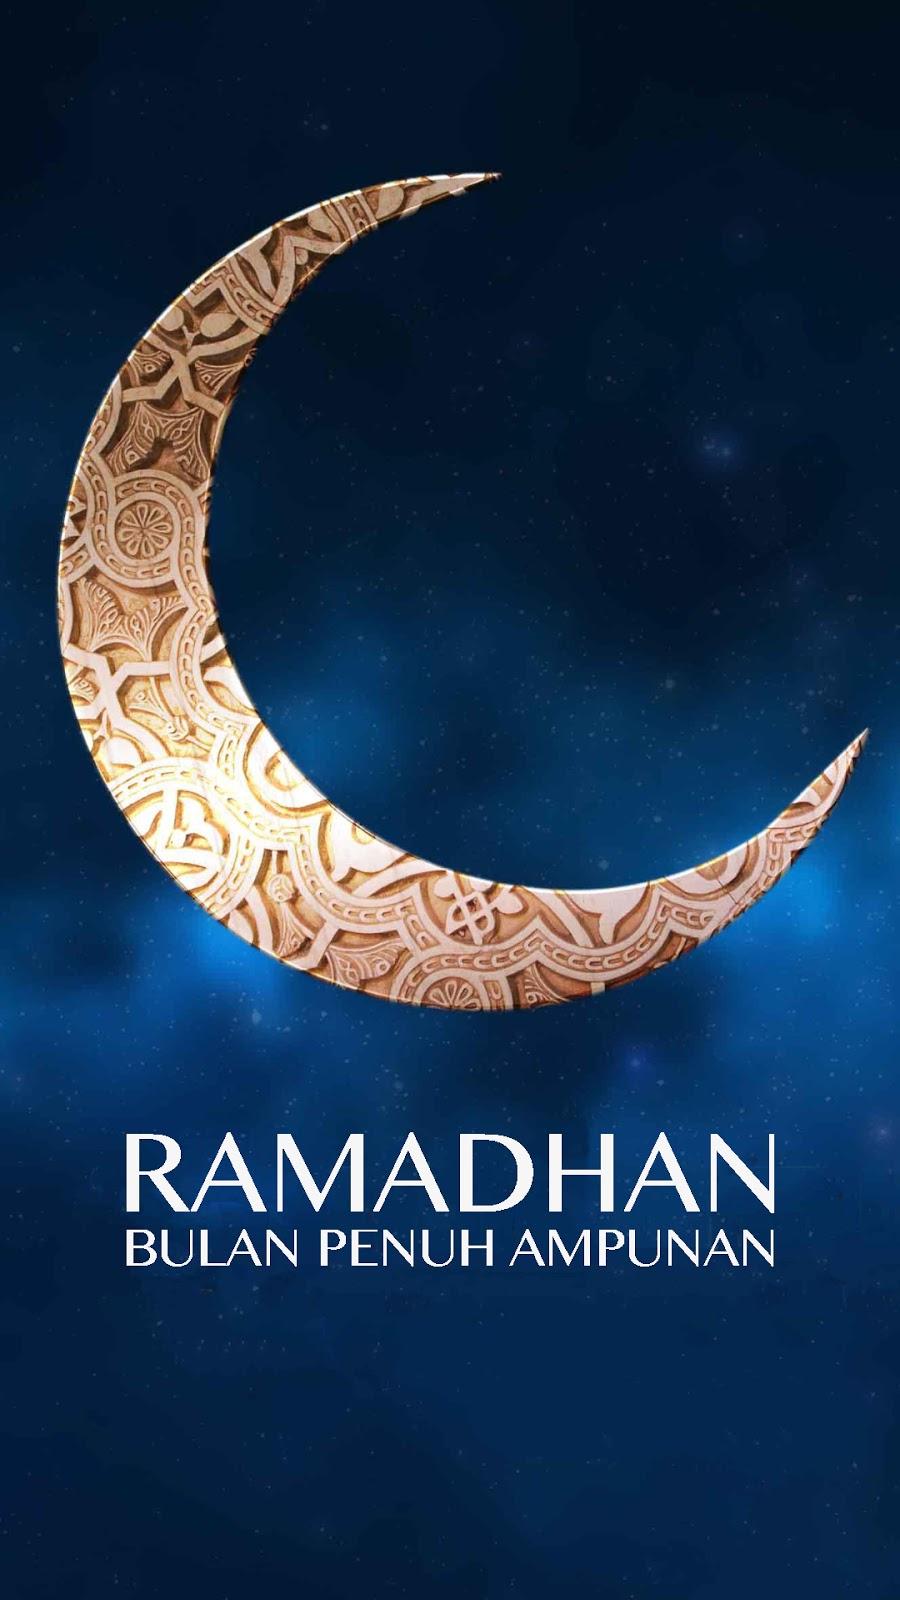 Background Ramadhan Wallpaper HD Android Penuh Hikmah